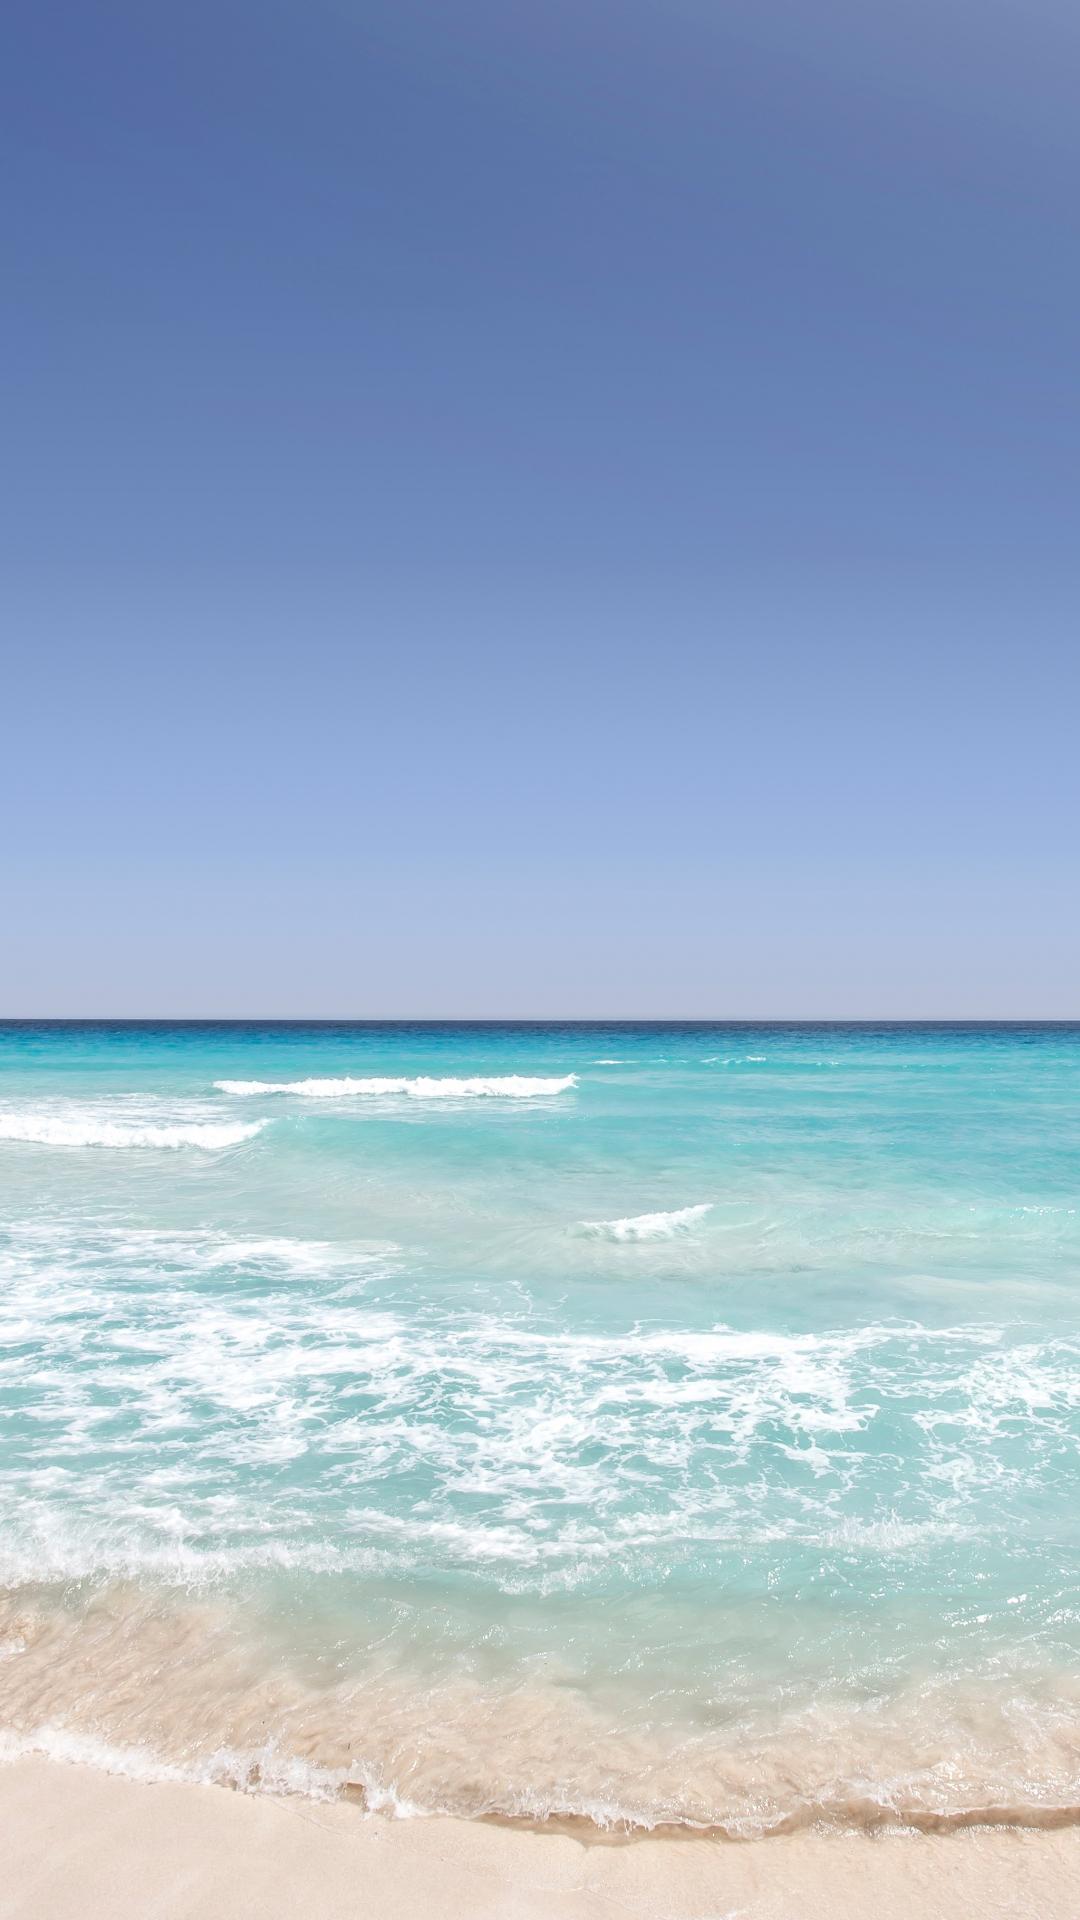 Ocean Washing Ashore iPhone Wallpaper